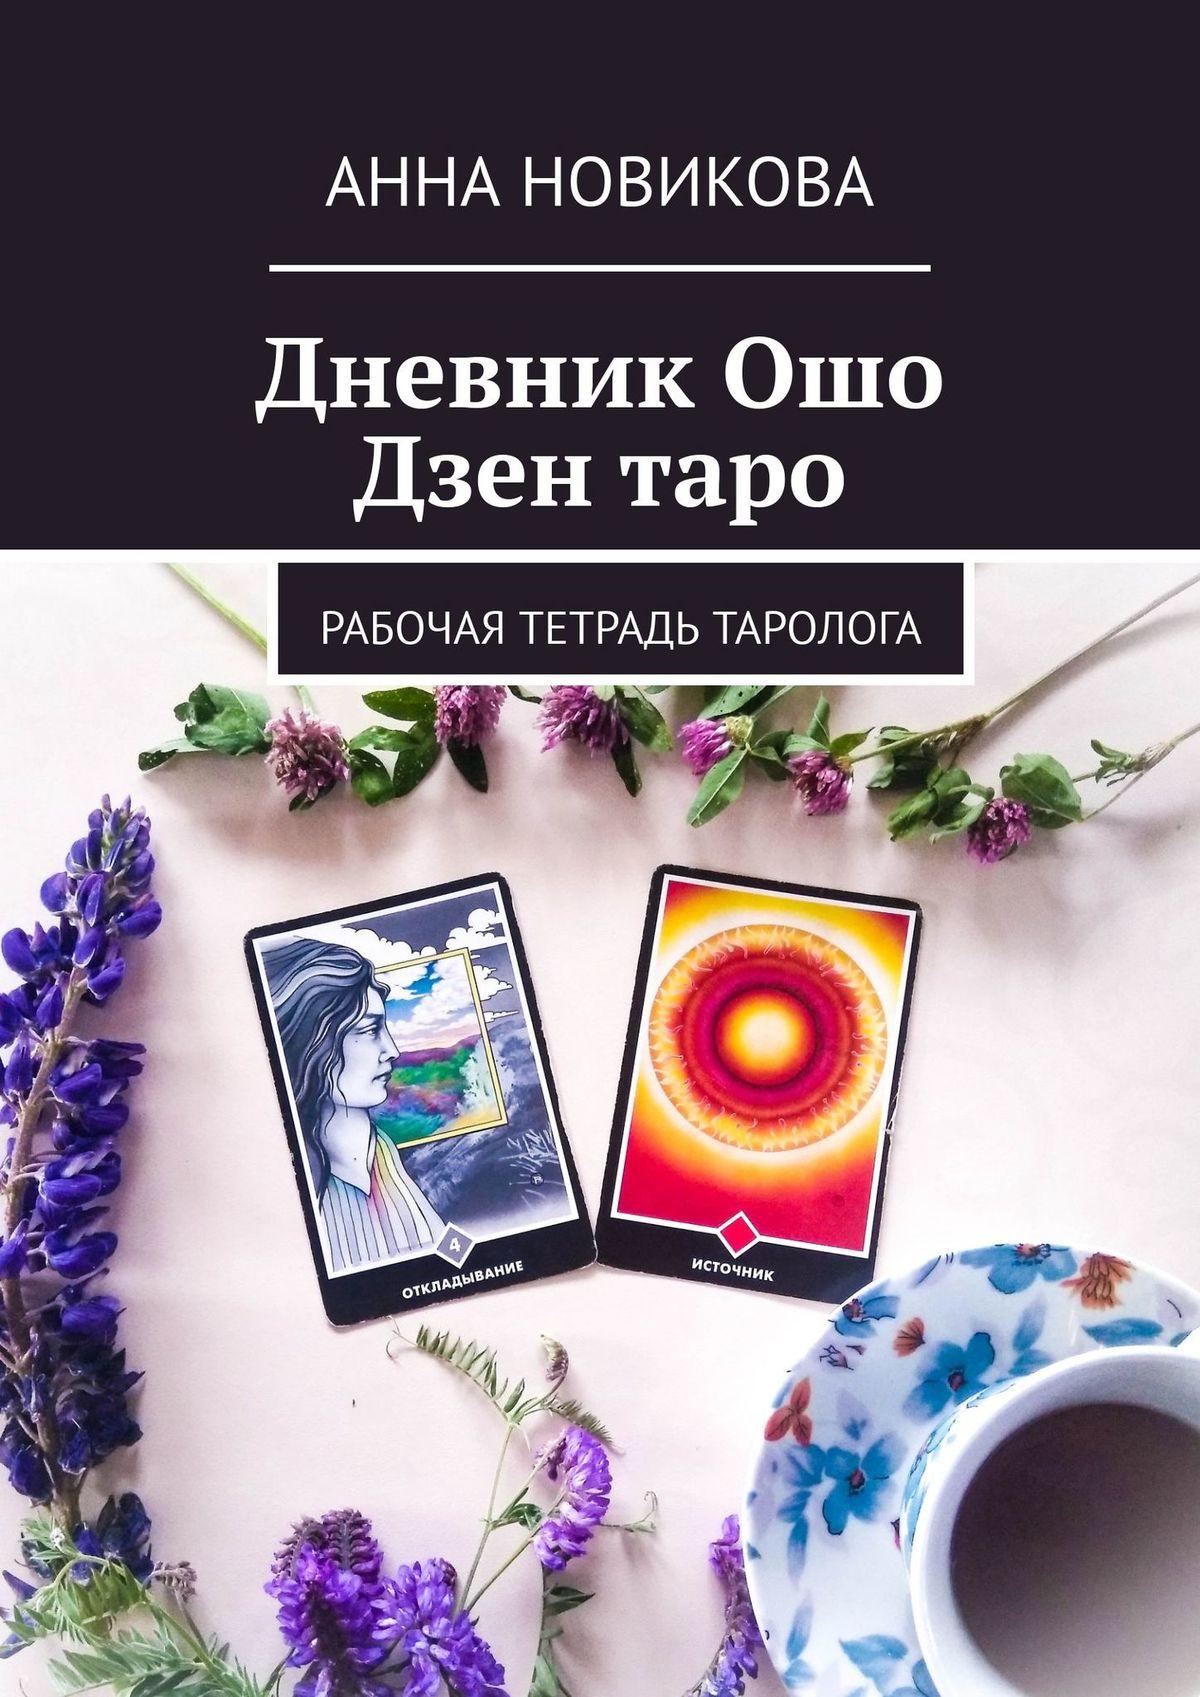 Анна Новикова Дневник Ошо Дзен таро. Рабочая тетрадь таролога цена